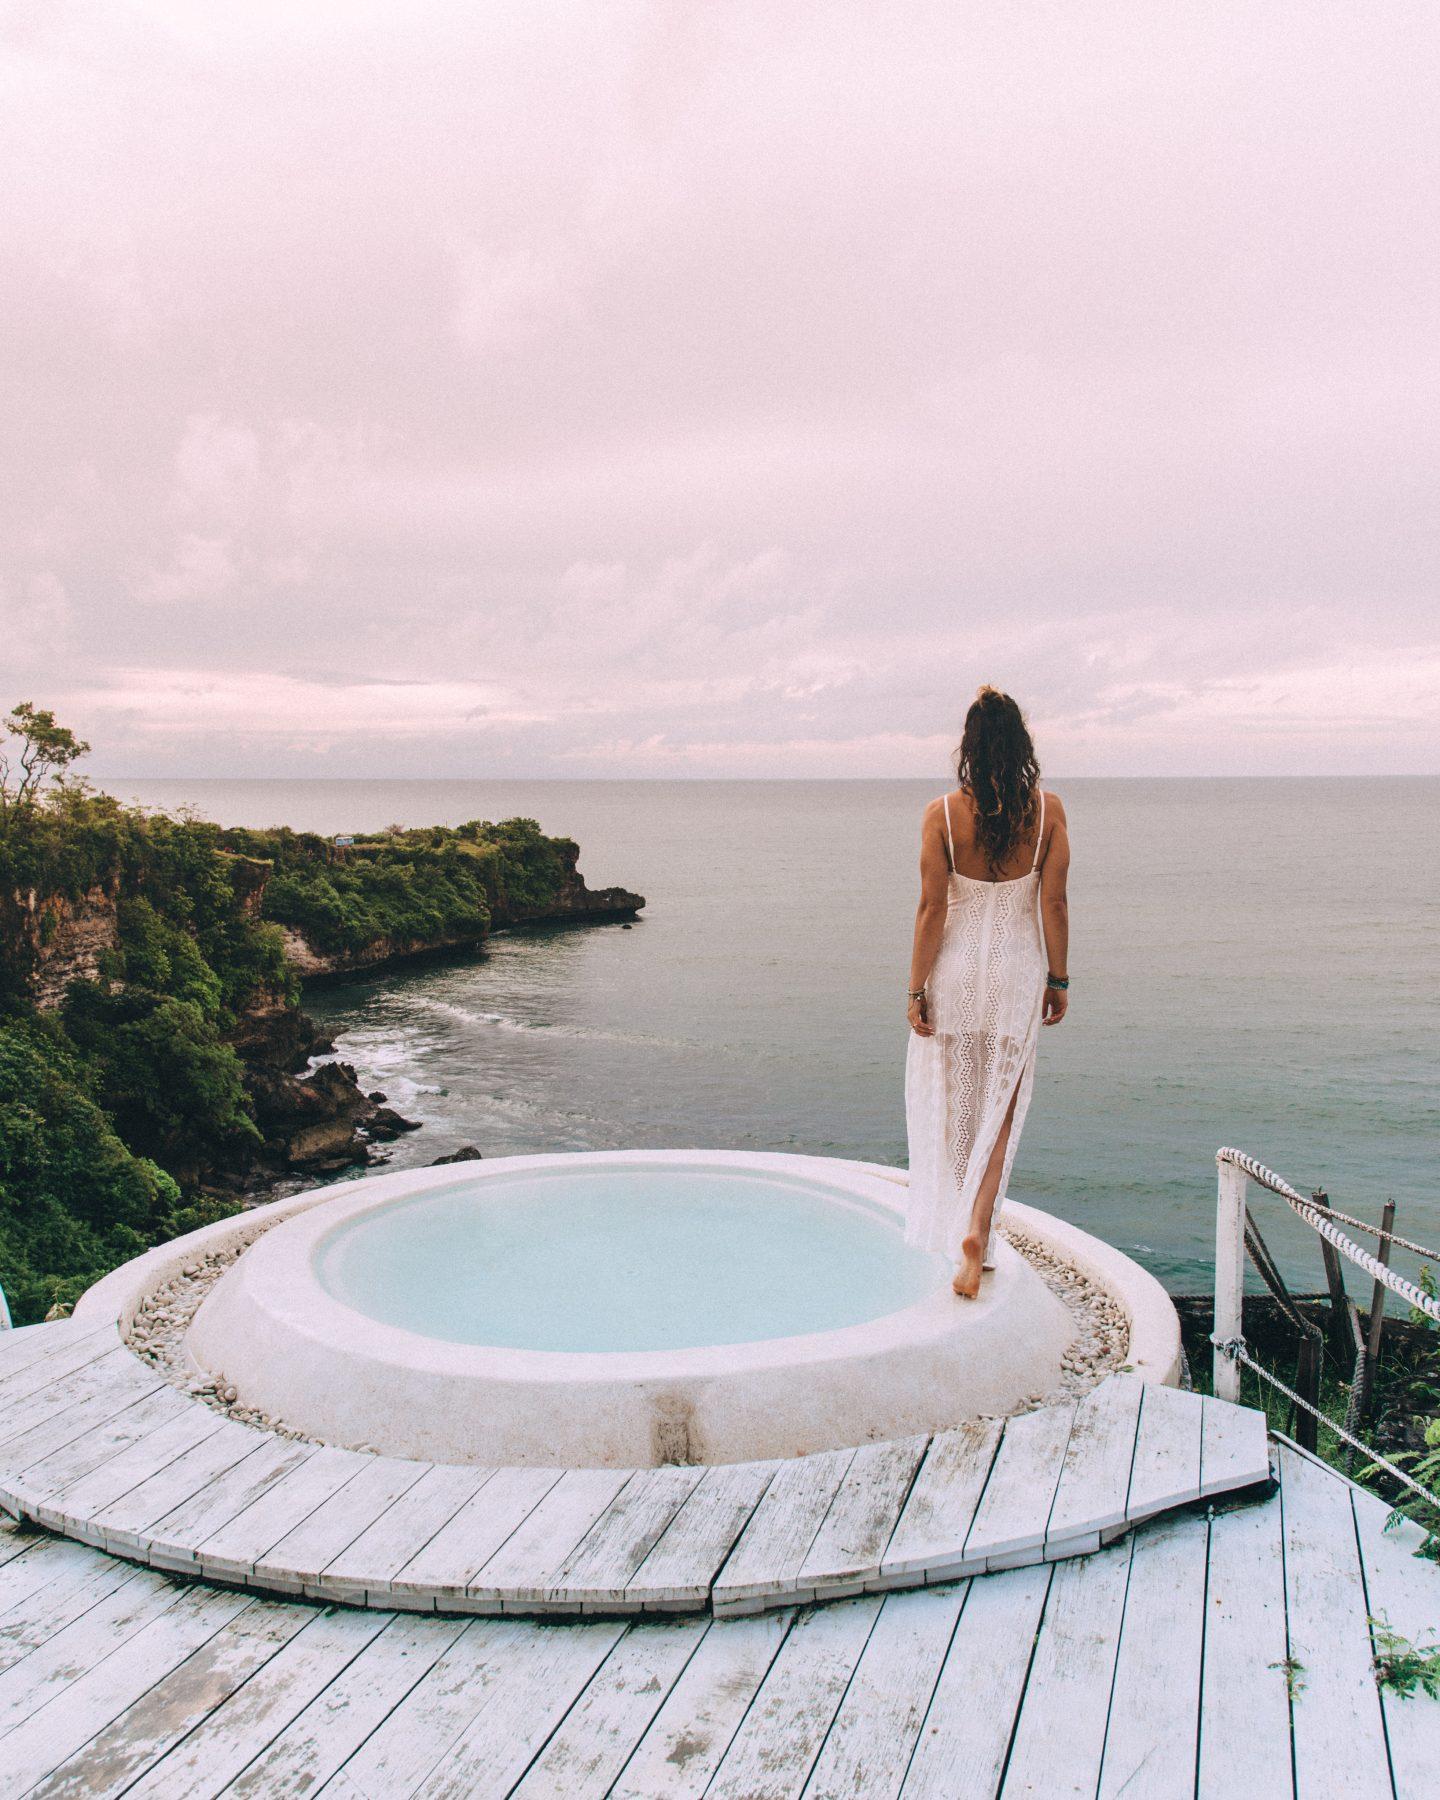 The hot tub at La Joya Biu Biu in Uluwatu Bali at sunset